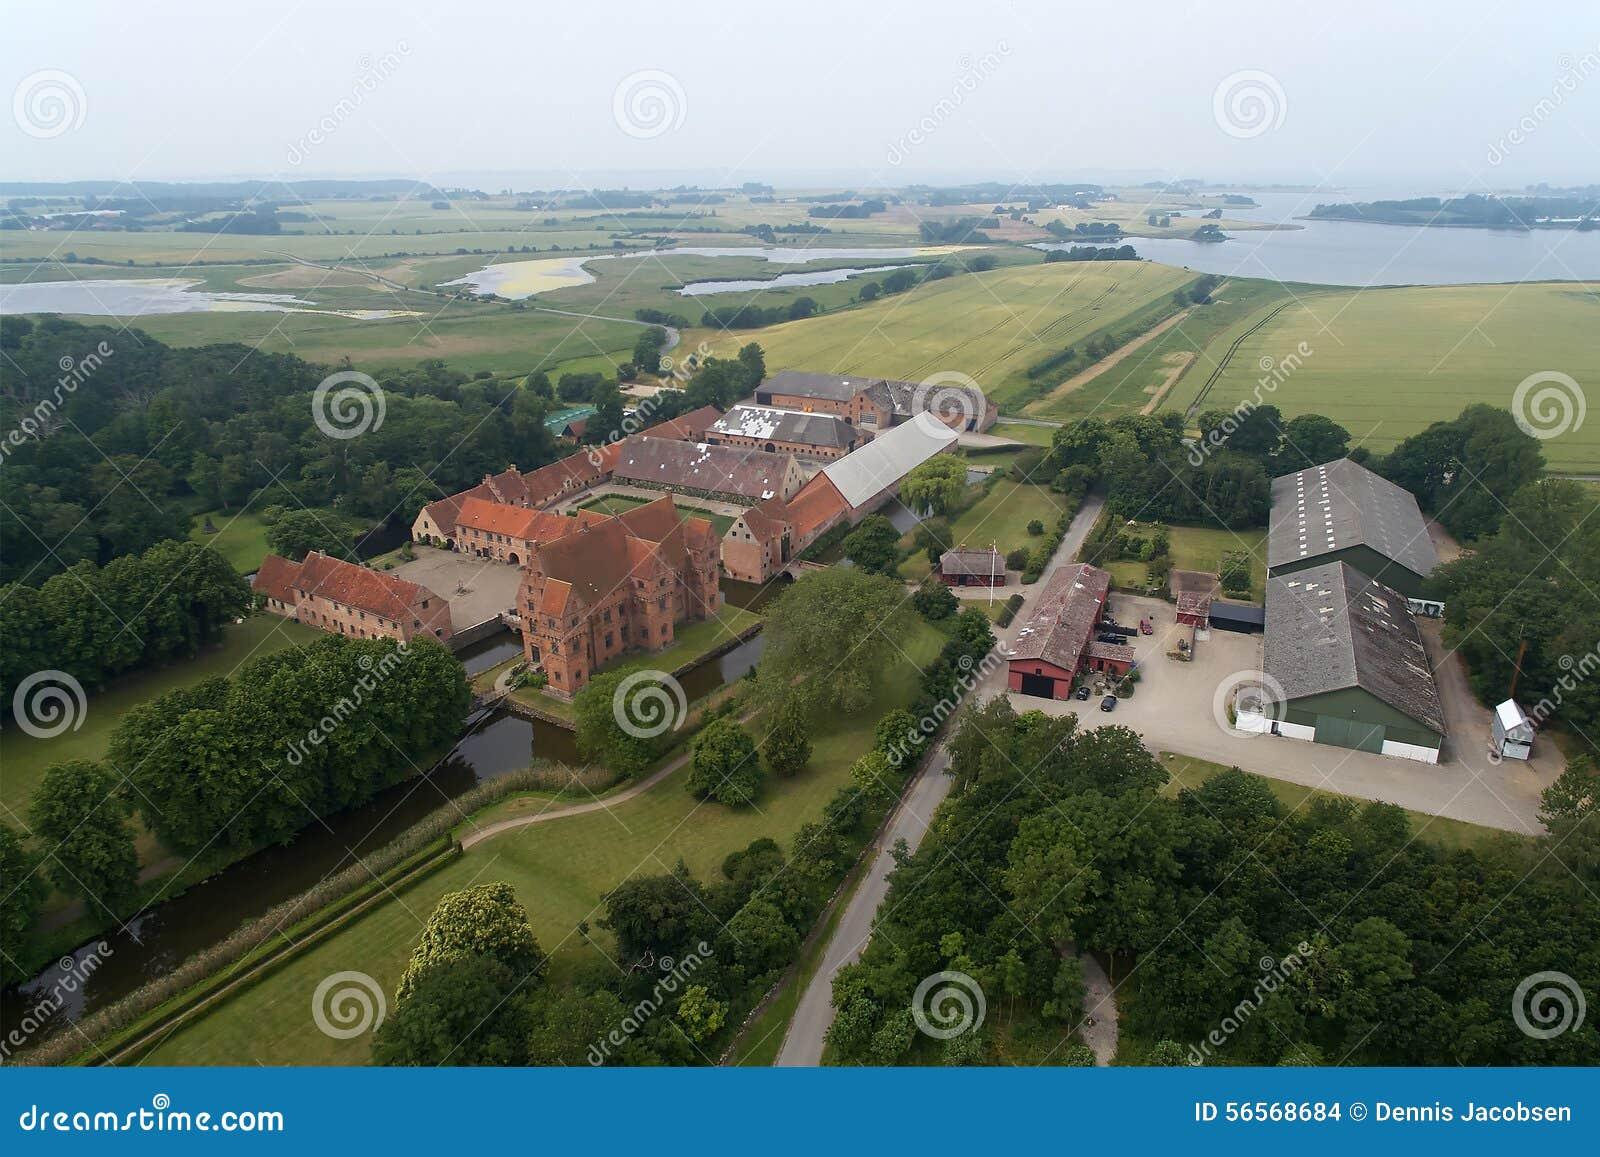 Download Εναέρια άποψη Borreby Castle (Herreborg), Δανία Εκδοτική Στοκ Εικόνα - εικόνα από σκανδιναβία, κόκκινος: 56568684